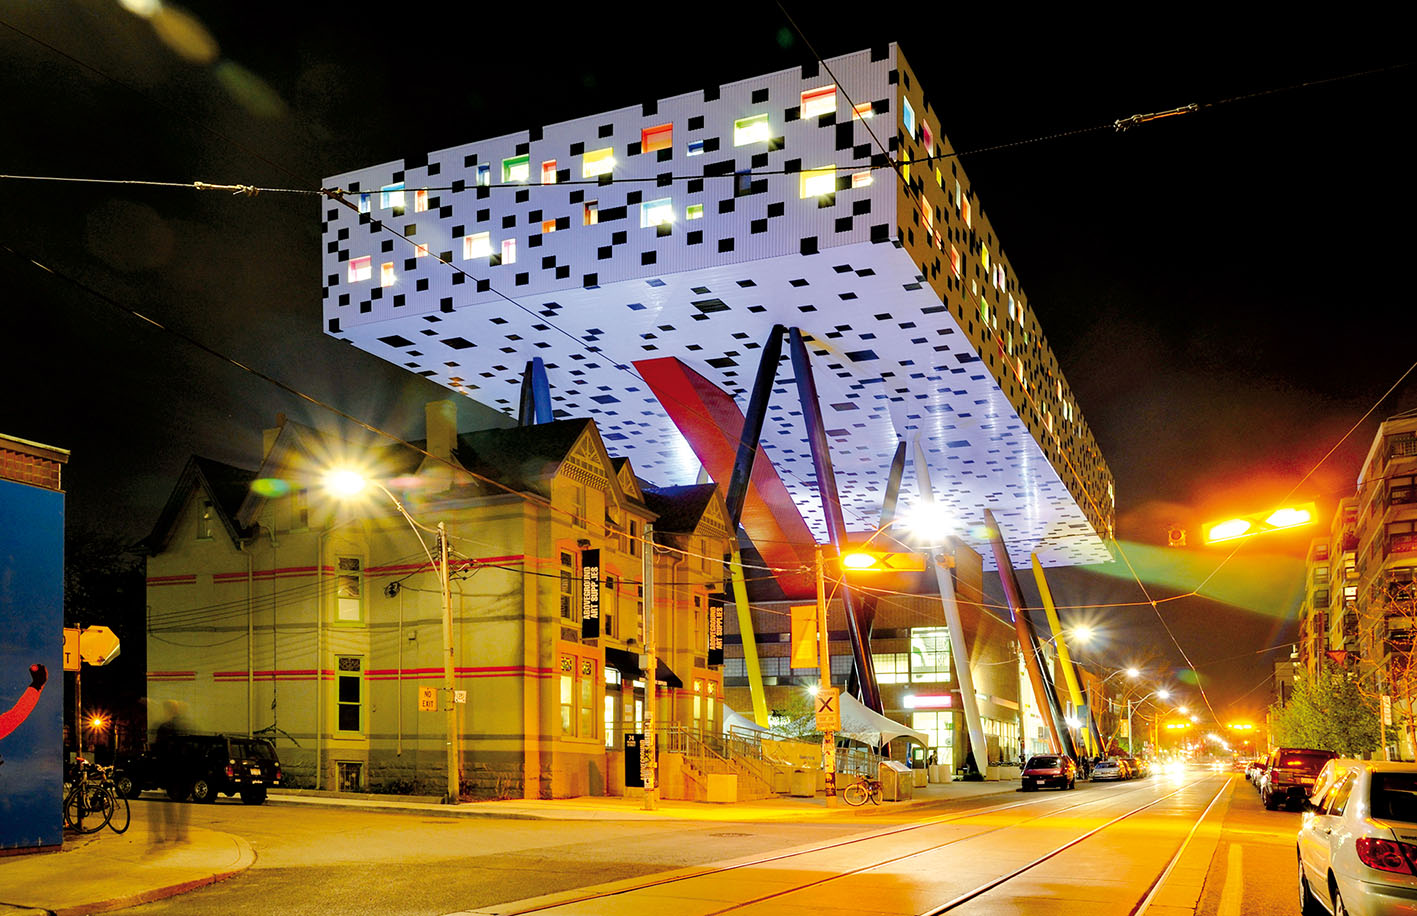 Sharp Centre for Design à Toronto, 2004, Alsop Architects. Ph. © Taxiarchos228.